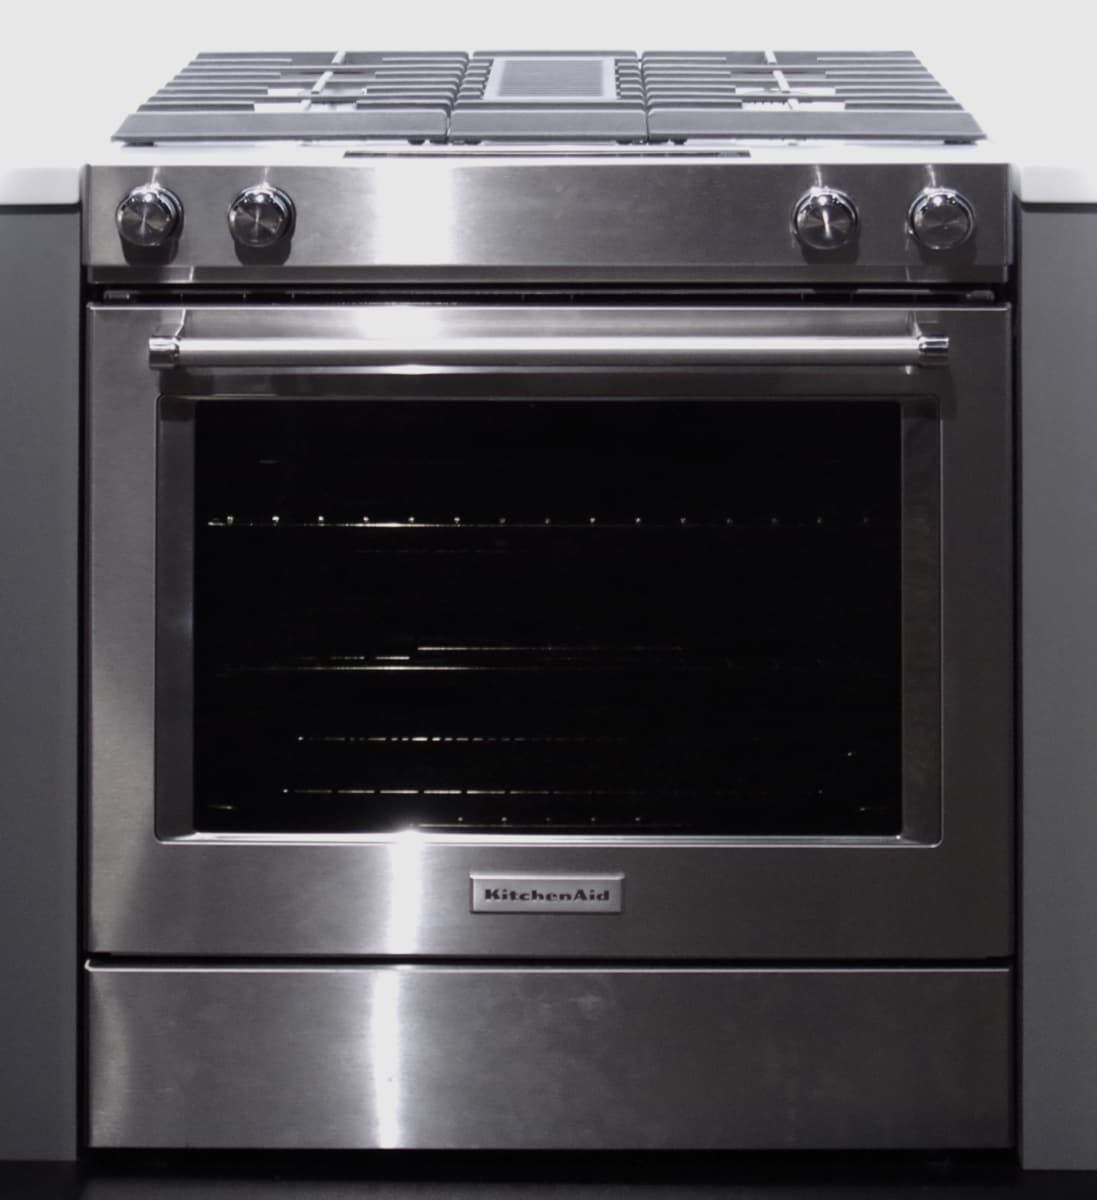 No Vent Required Kitchenaid Offers New Downdraft Ranges Kitchen Aid Farmhouse Kitchen Inspiration Kitchen Refresh